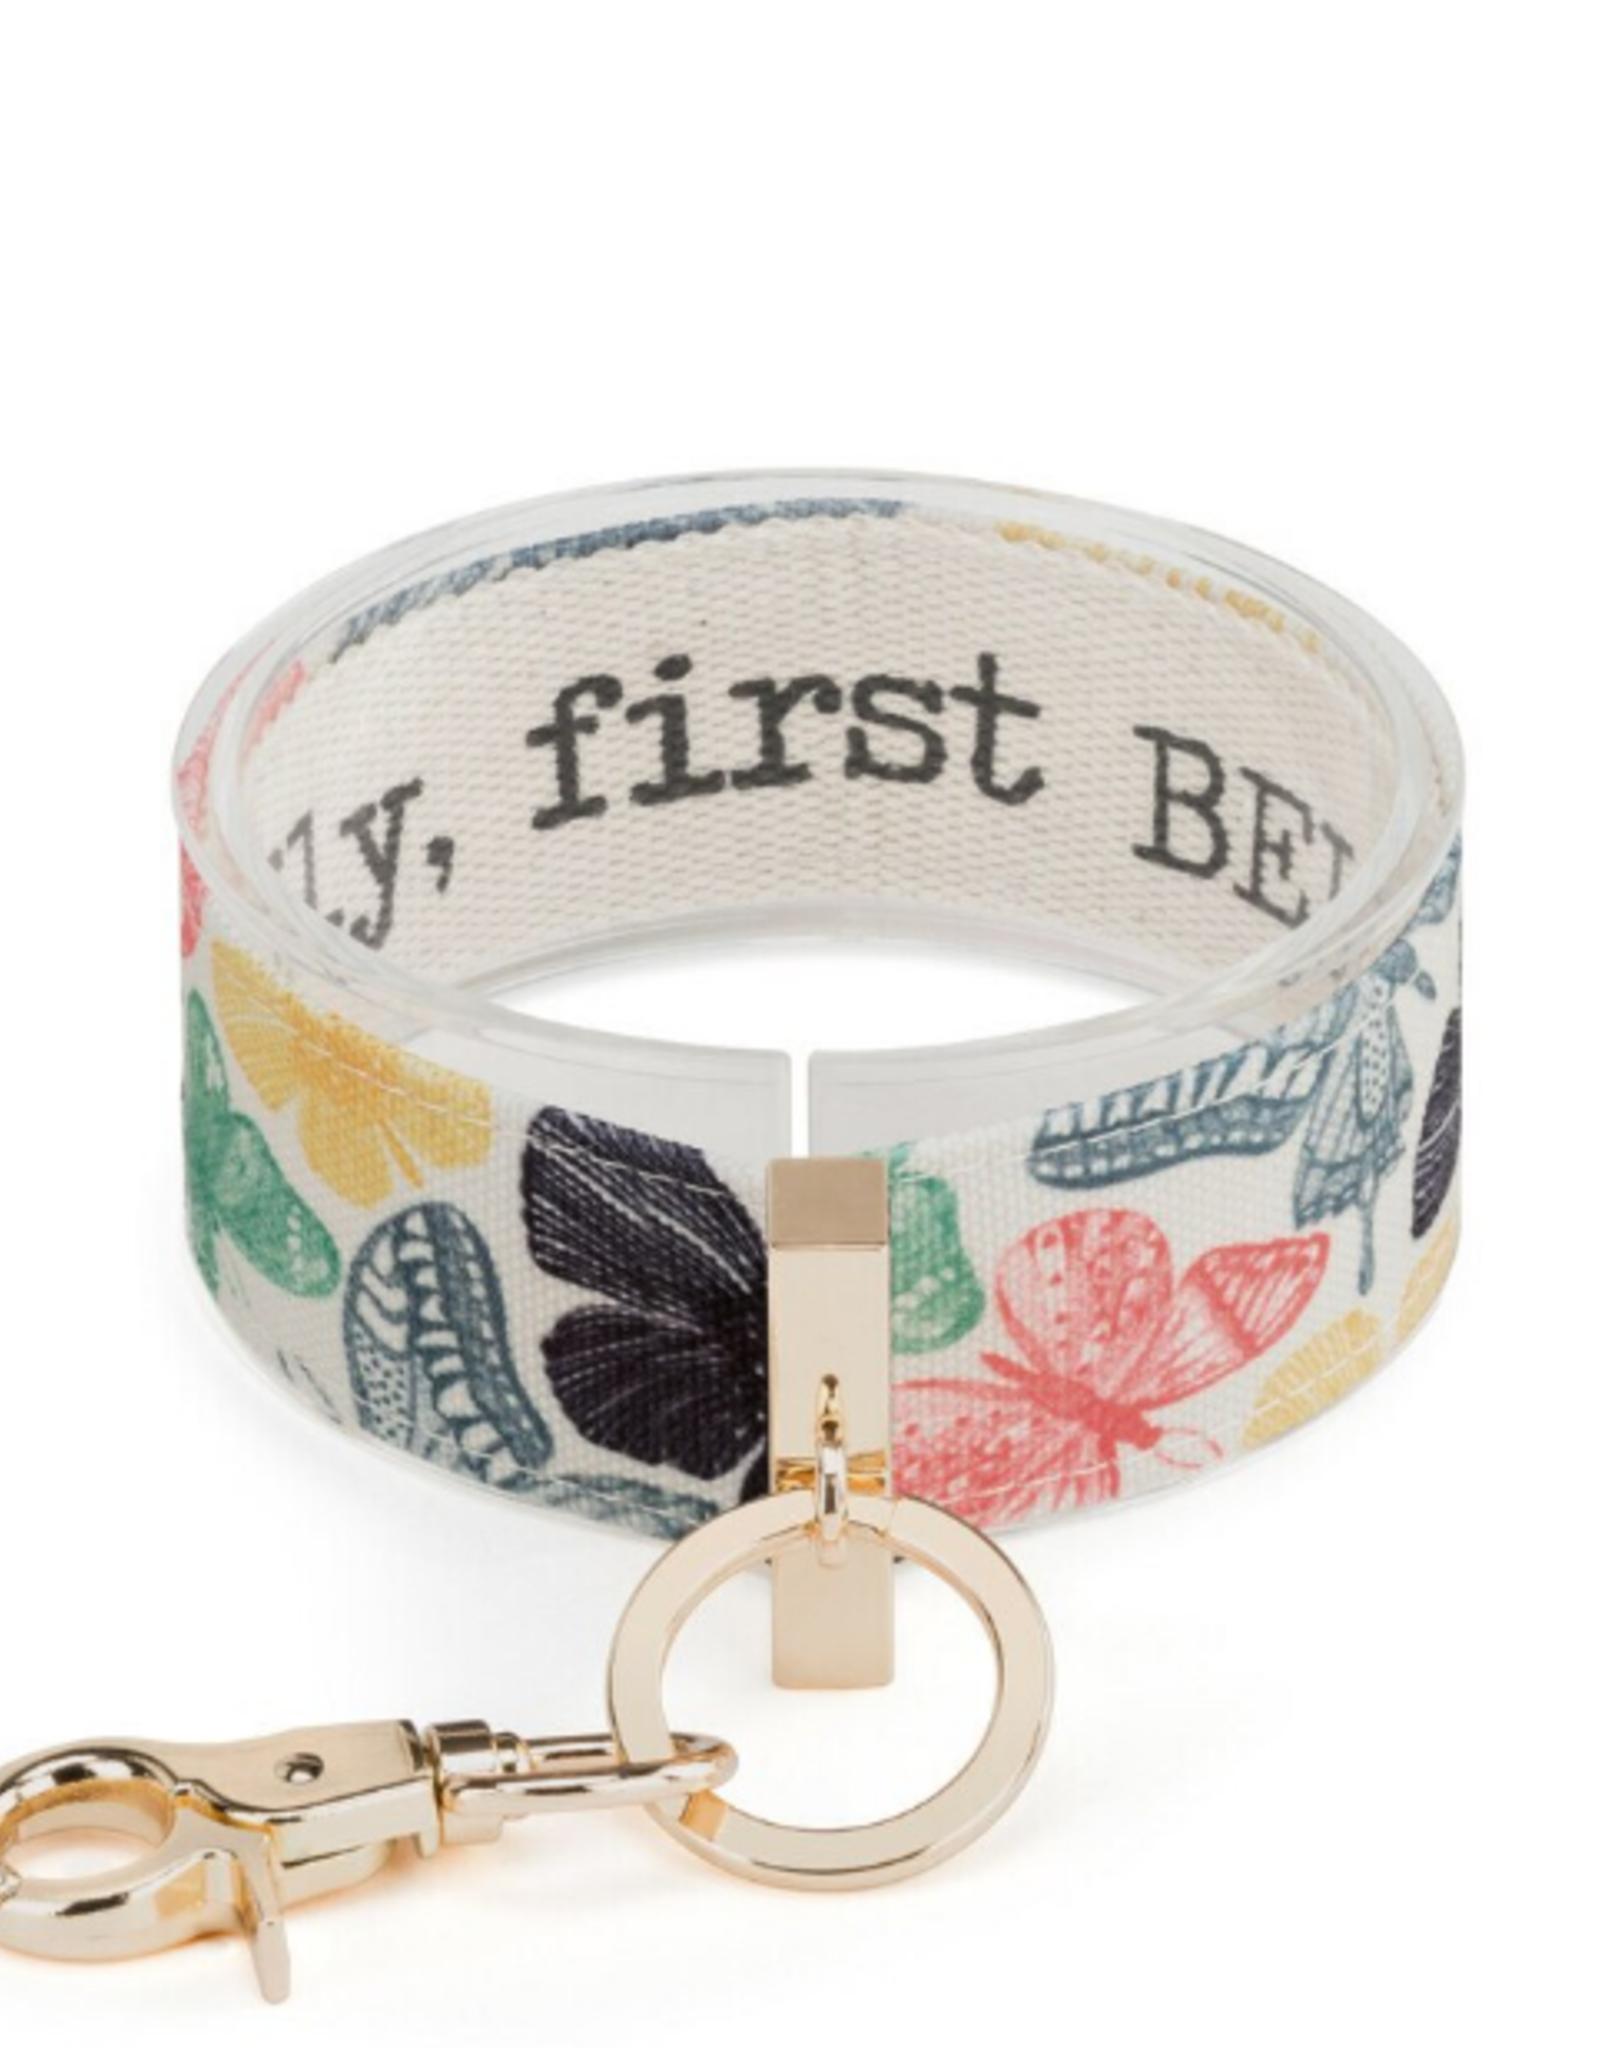 Wrist Strap Key Chain, To Fly, First Believe